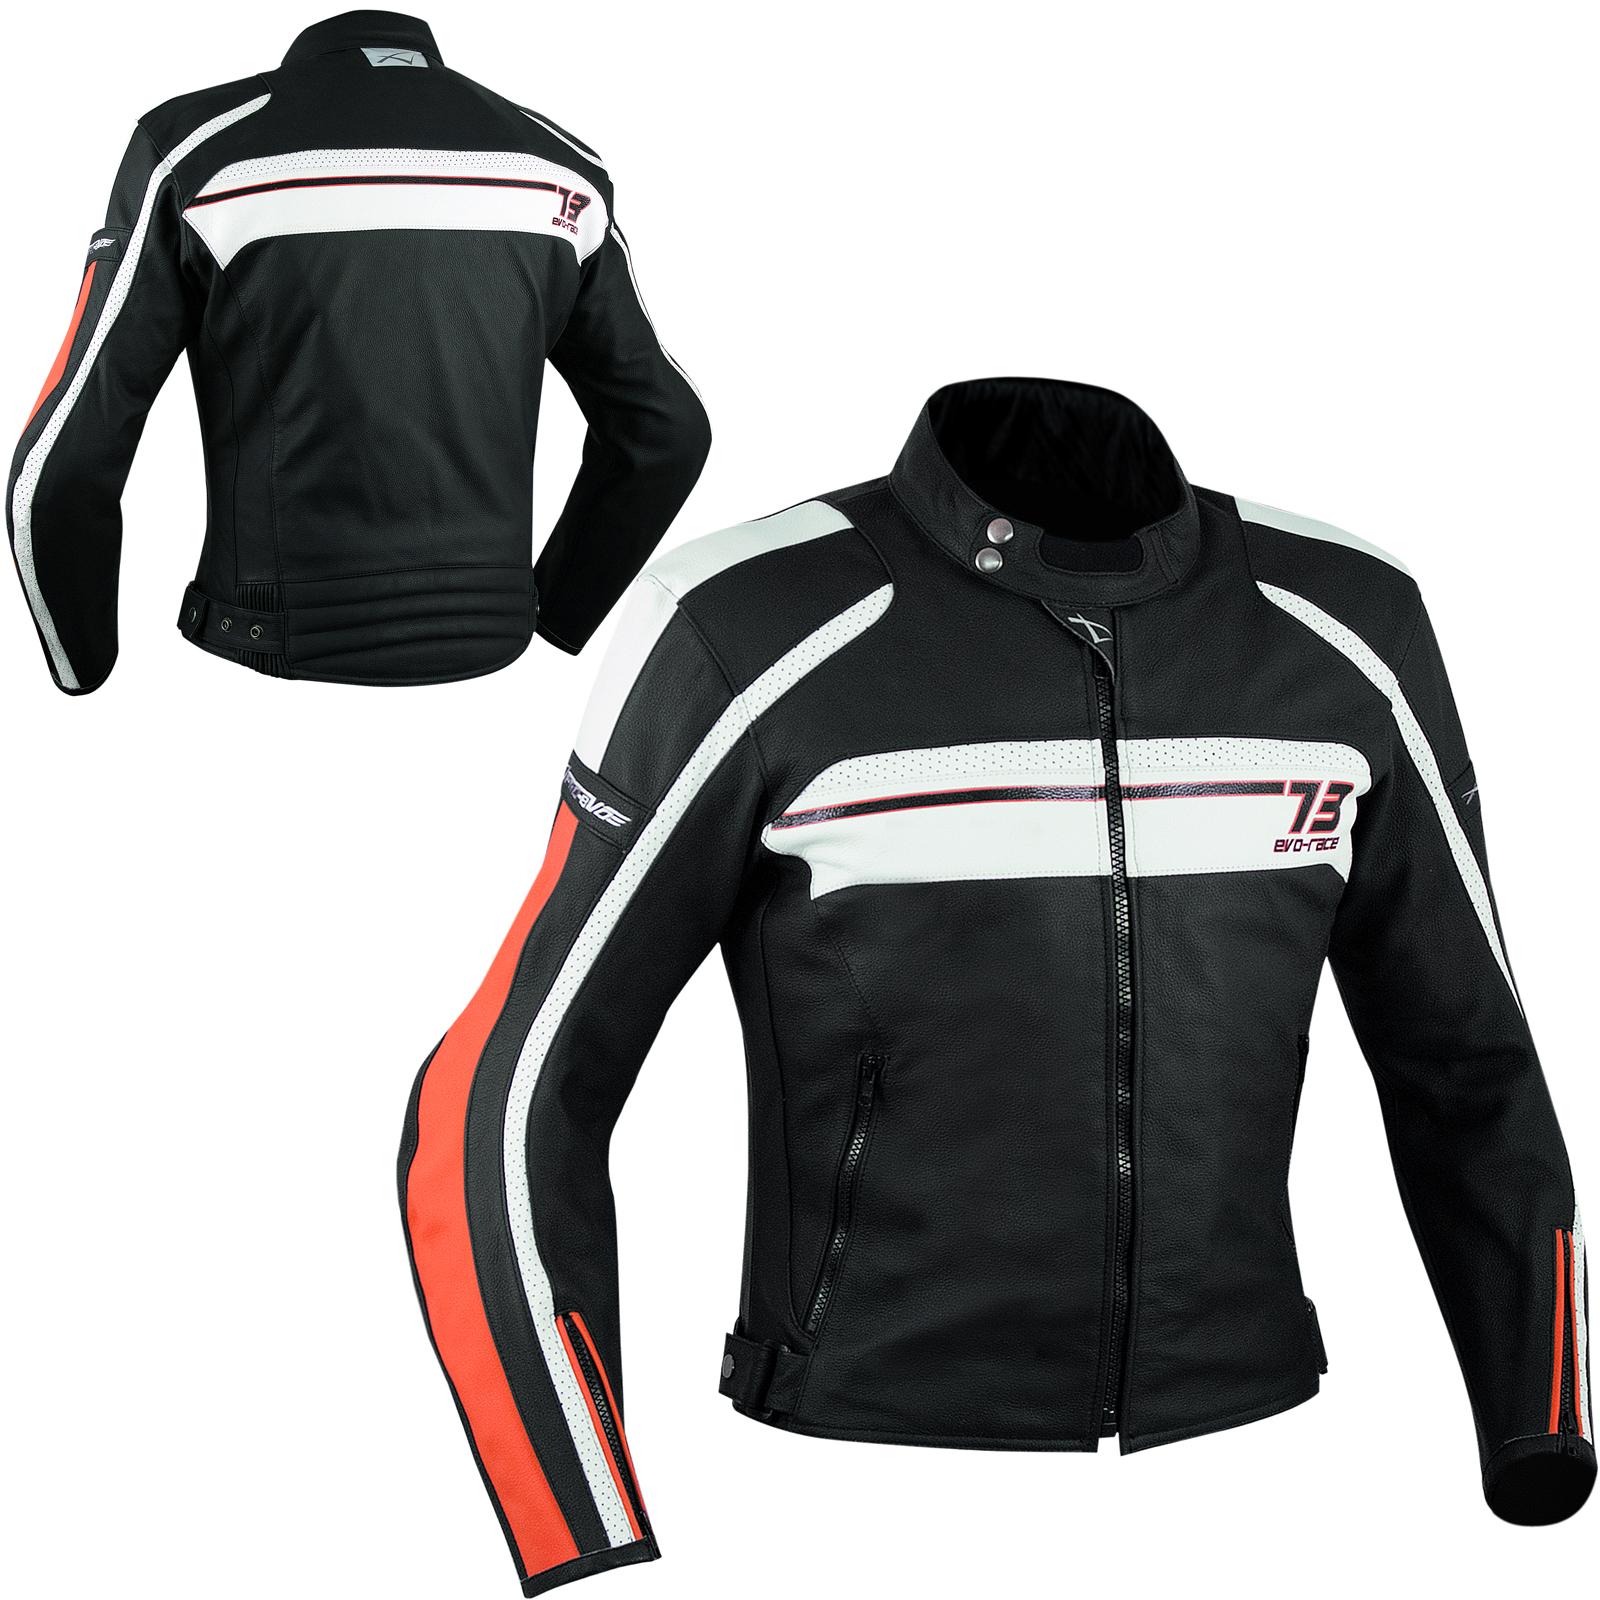 Naked-Sport-Moto-Chaqueta-Piel-Protecciones-CE-KTM-YAMAHA-HONDA-KAWASAKI